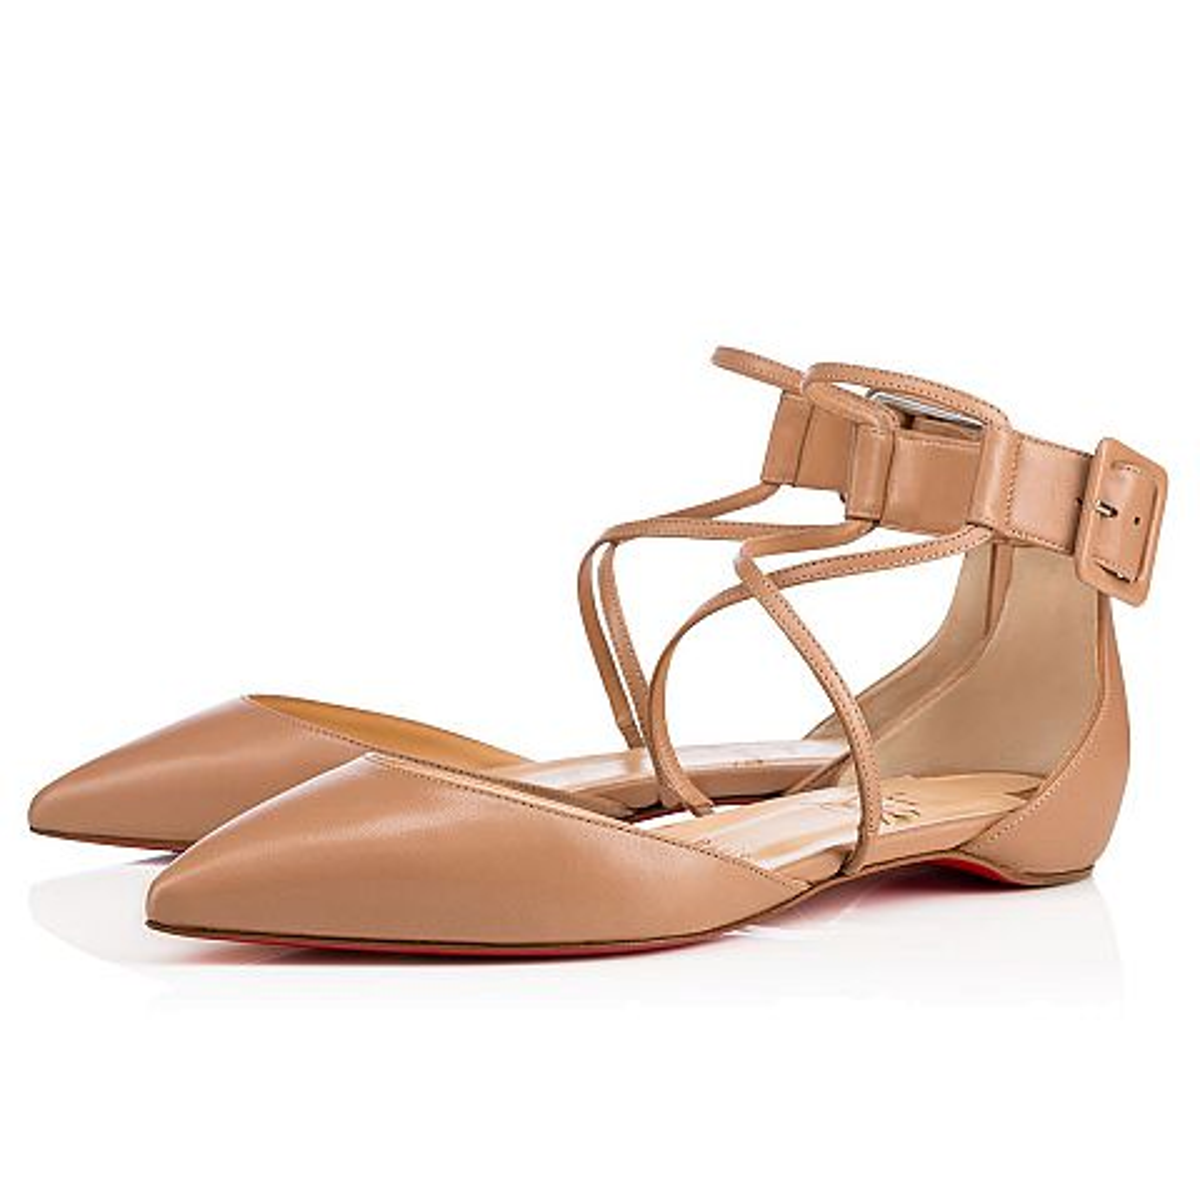 Women Shoes - Suzanna - Christian Louboutin